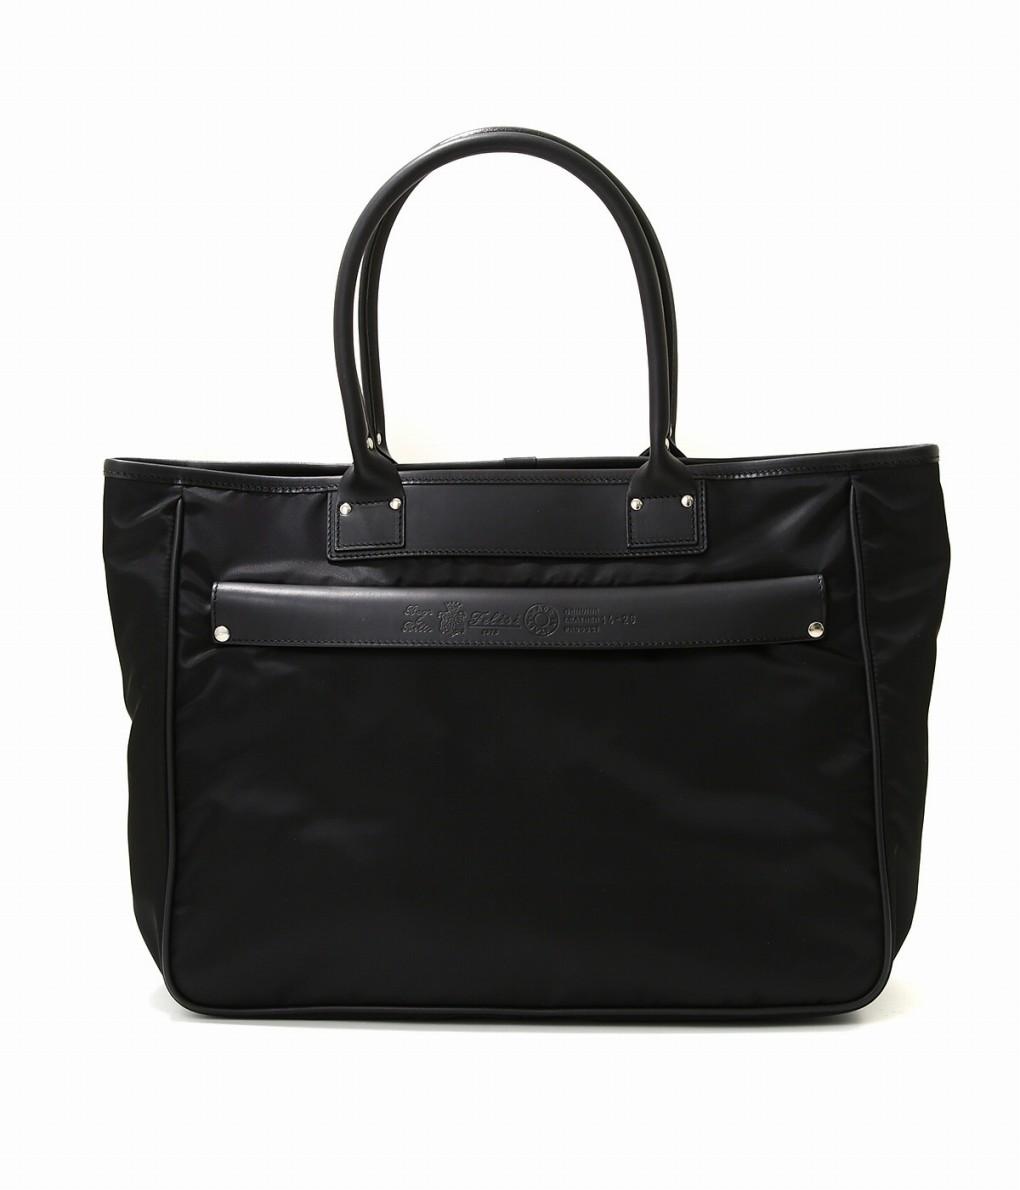 Felisi / フェリージ : TOTE BAG-BLACK- : トートバッグ トート メンズ : 14-26-DS-DS041 【MUS】